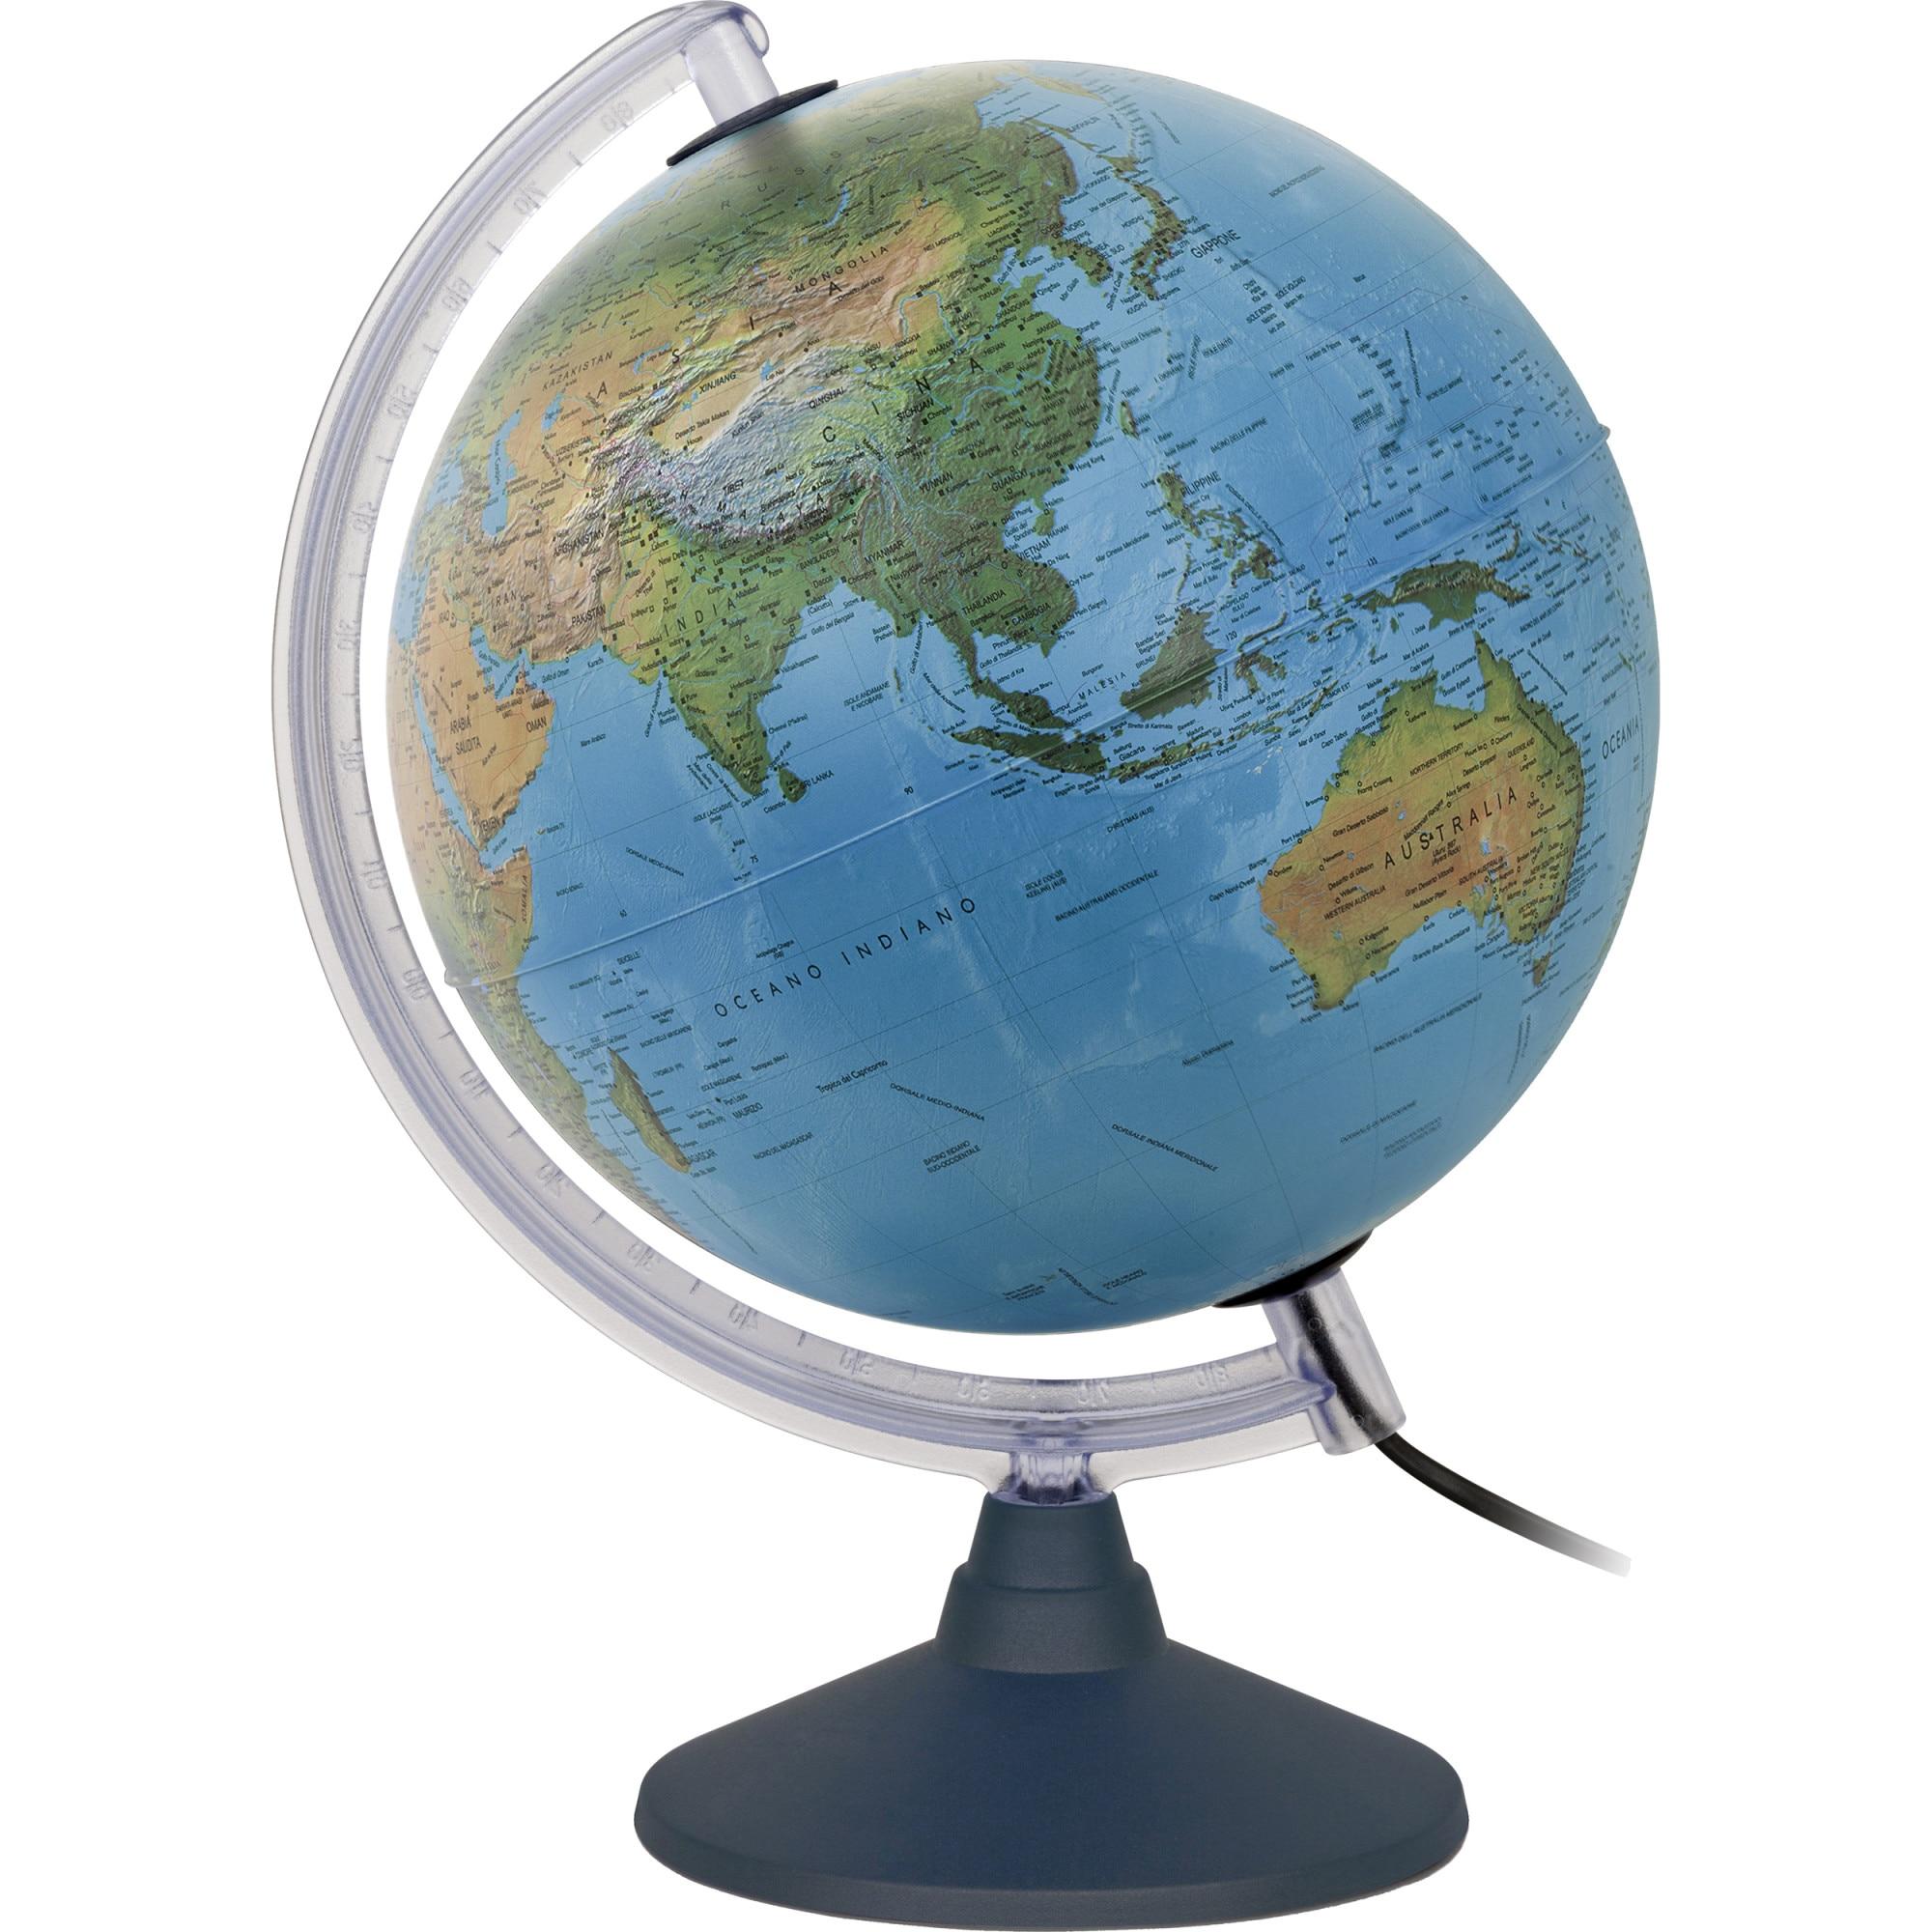 Fotografie Glob pamantesc iluminat Elite 25 cm cu harta fizica si politica, in limba romana